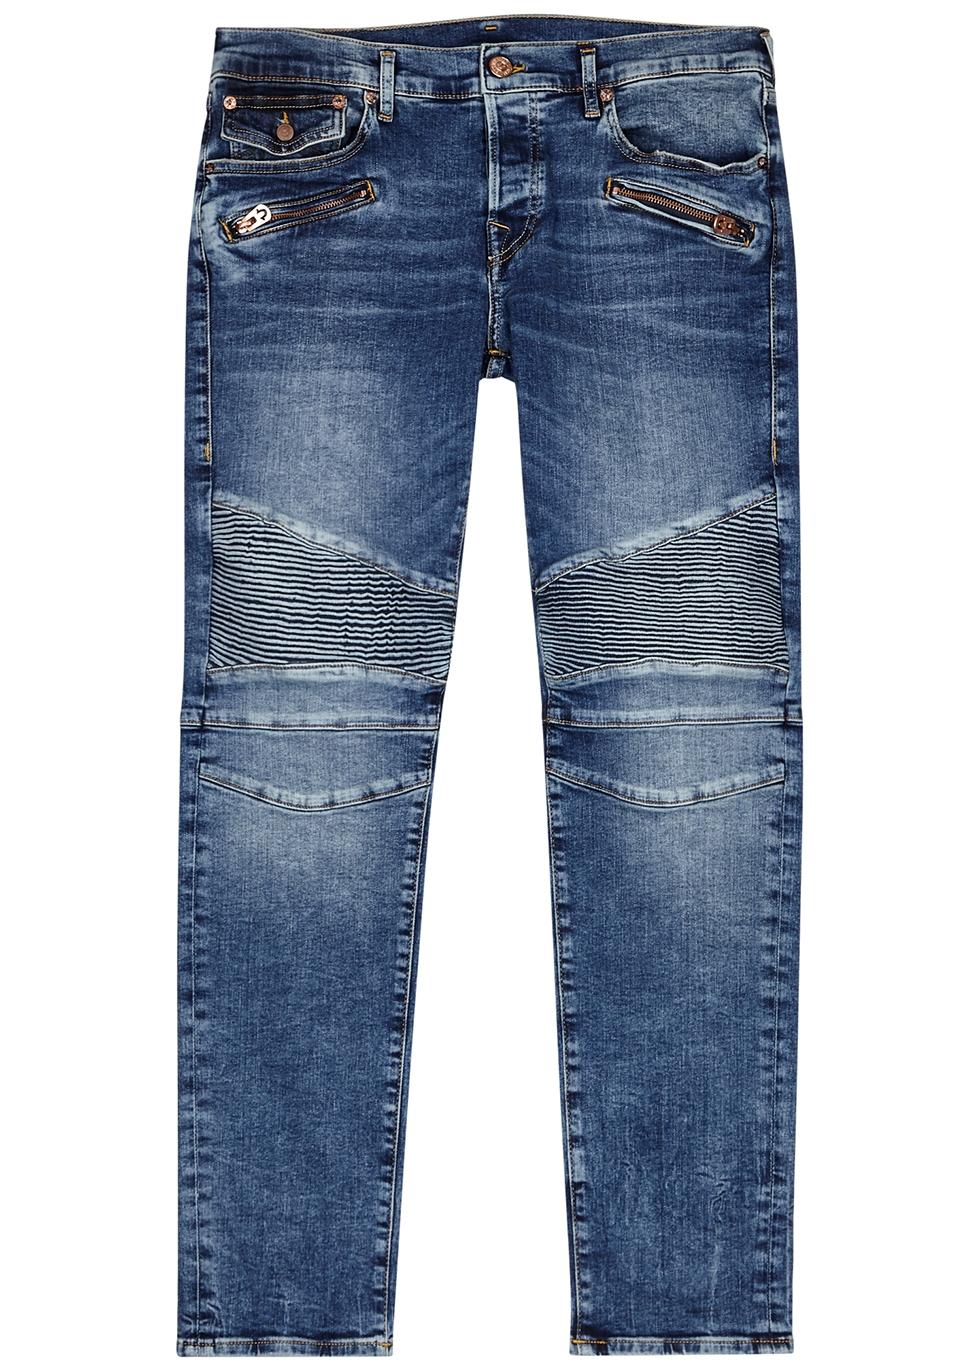 Rocco blue skinny biker jeans